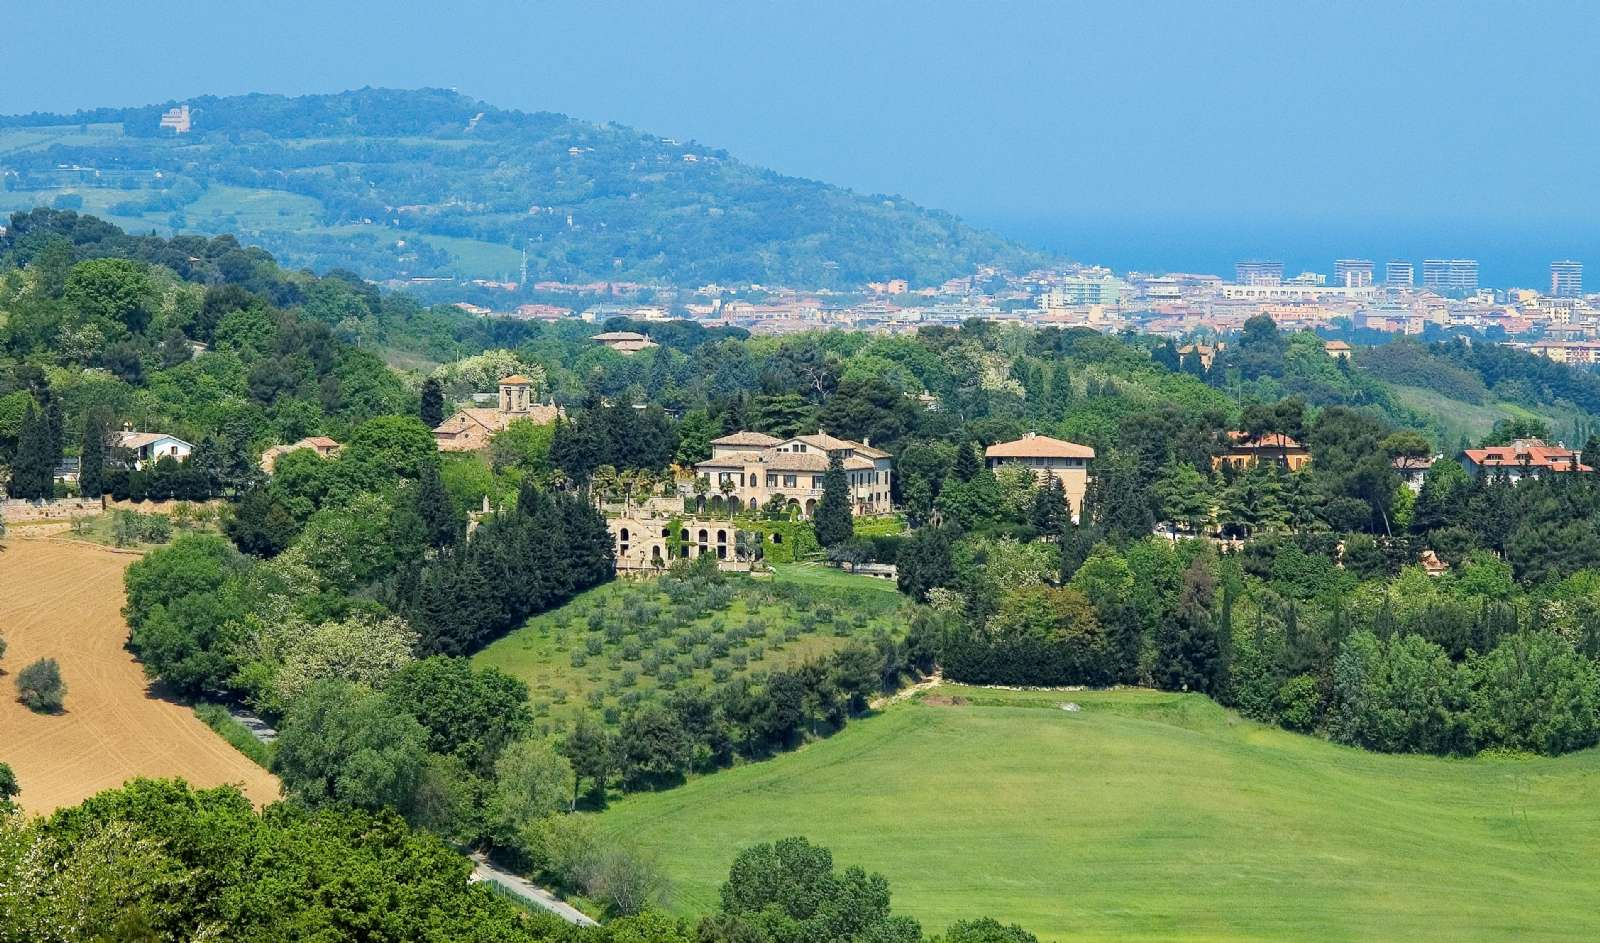 Villa Cattani Stuart Pesaro city and the coast in the background